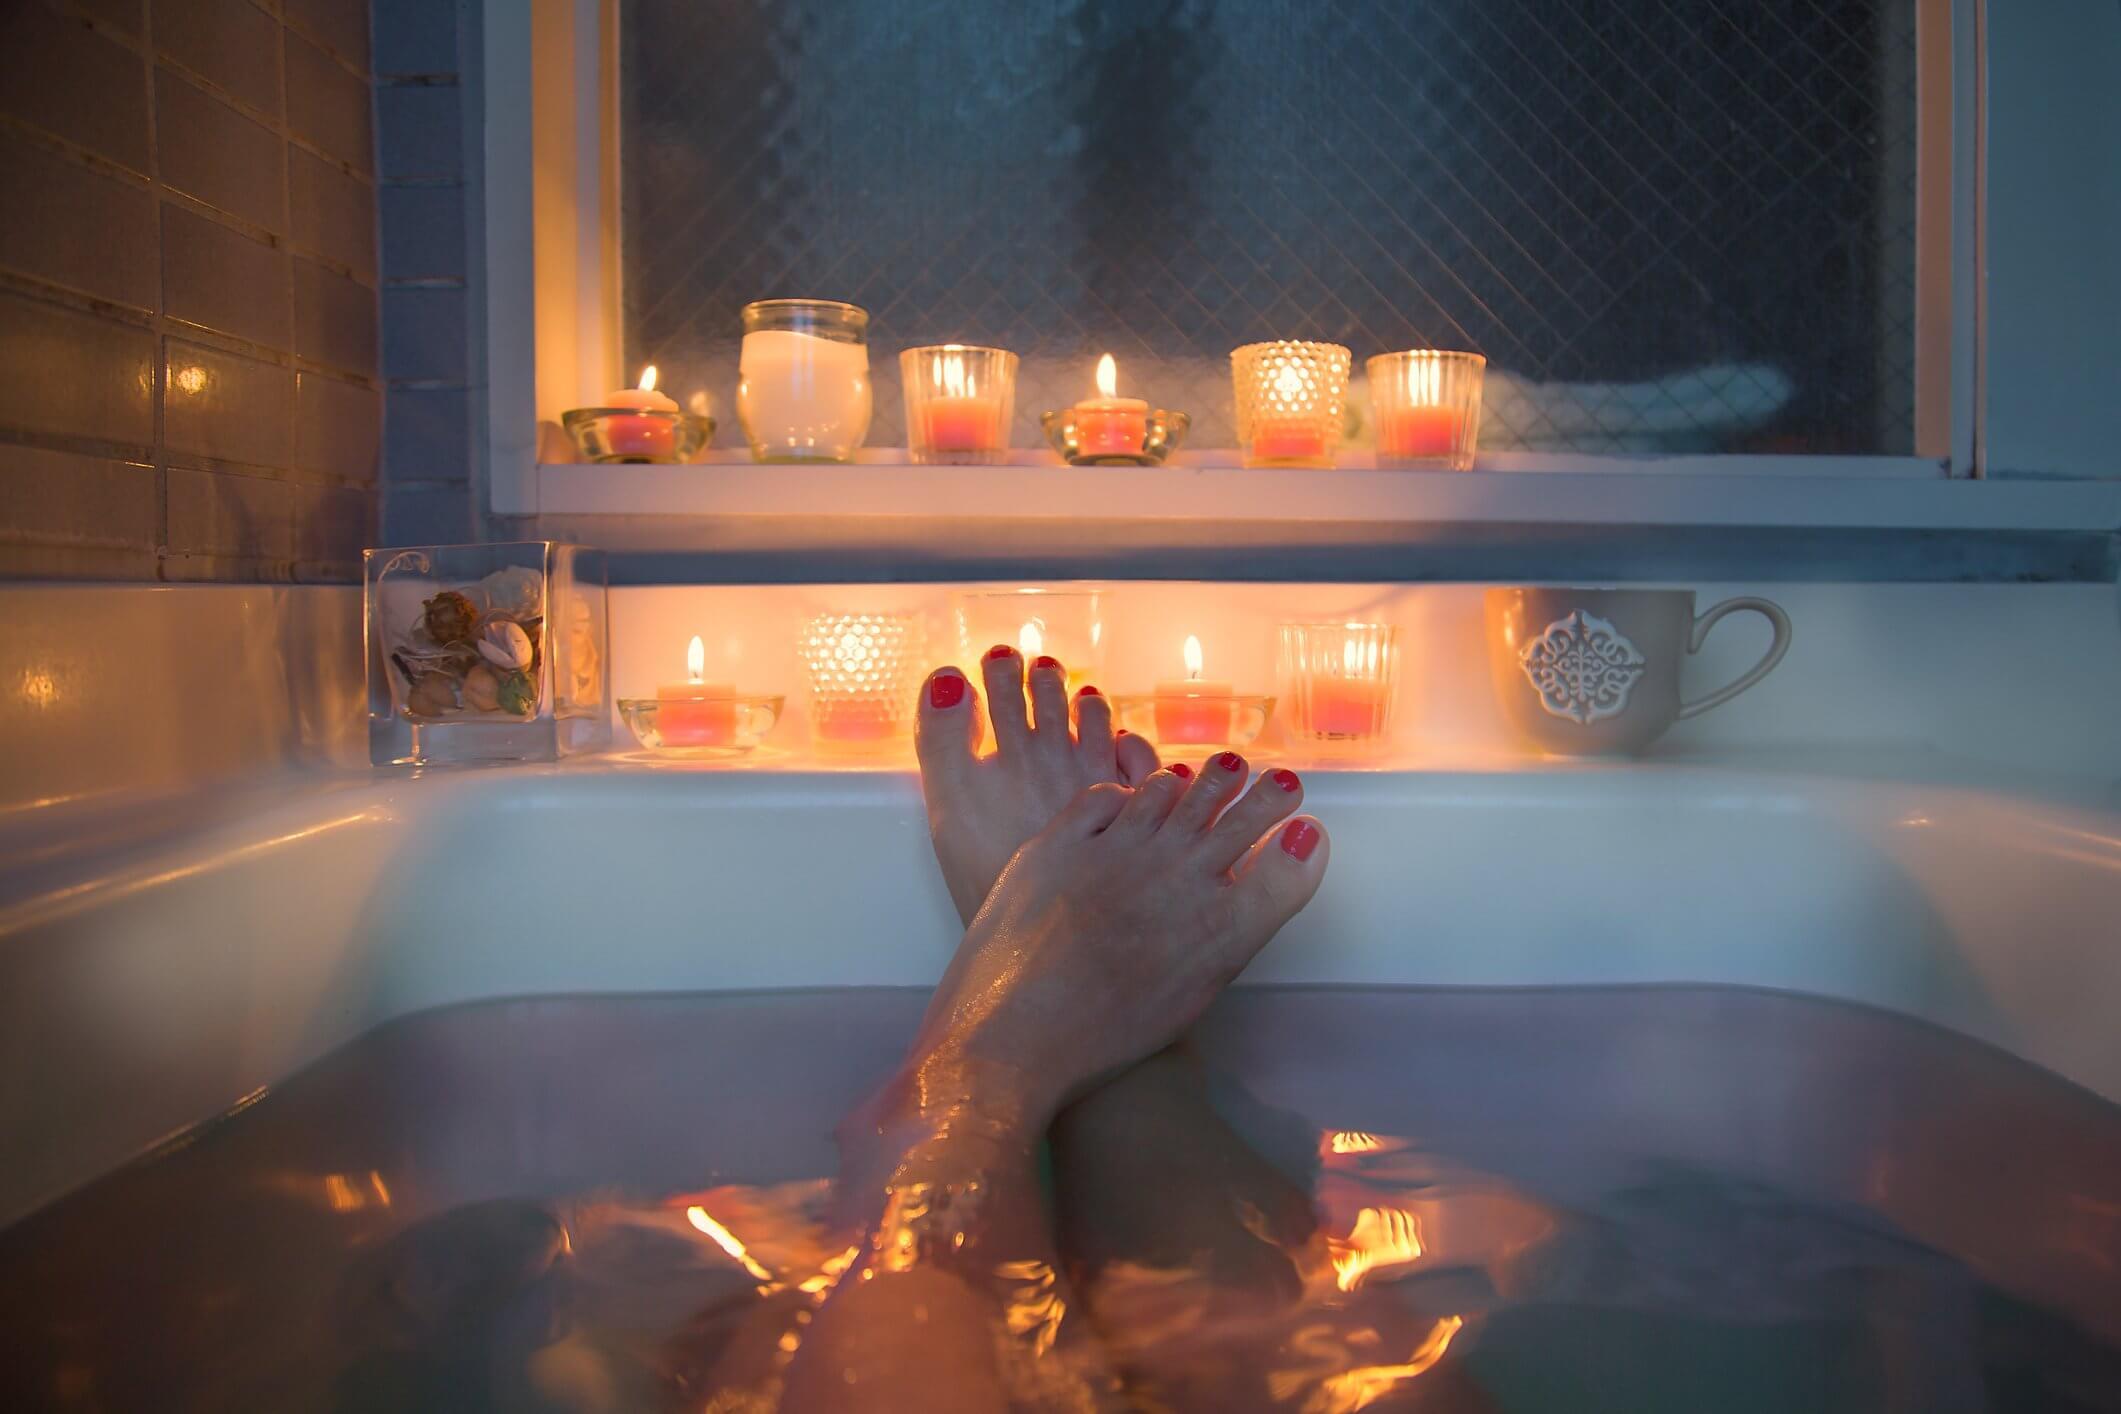 feet of the woman inside the bathtub